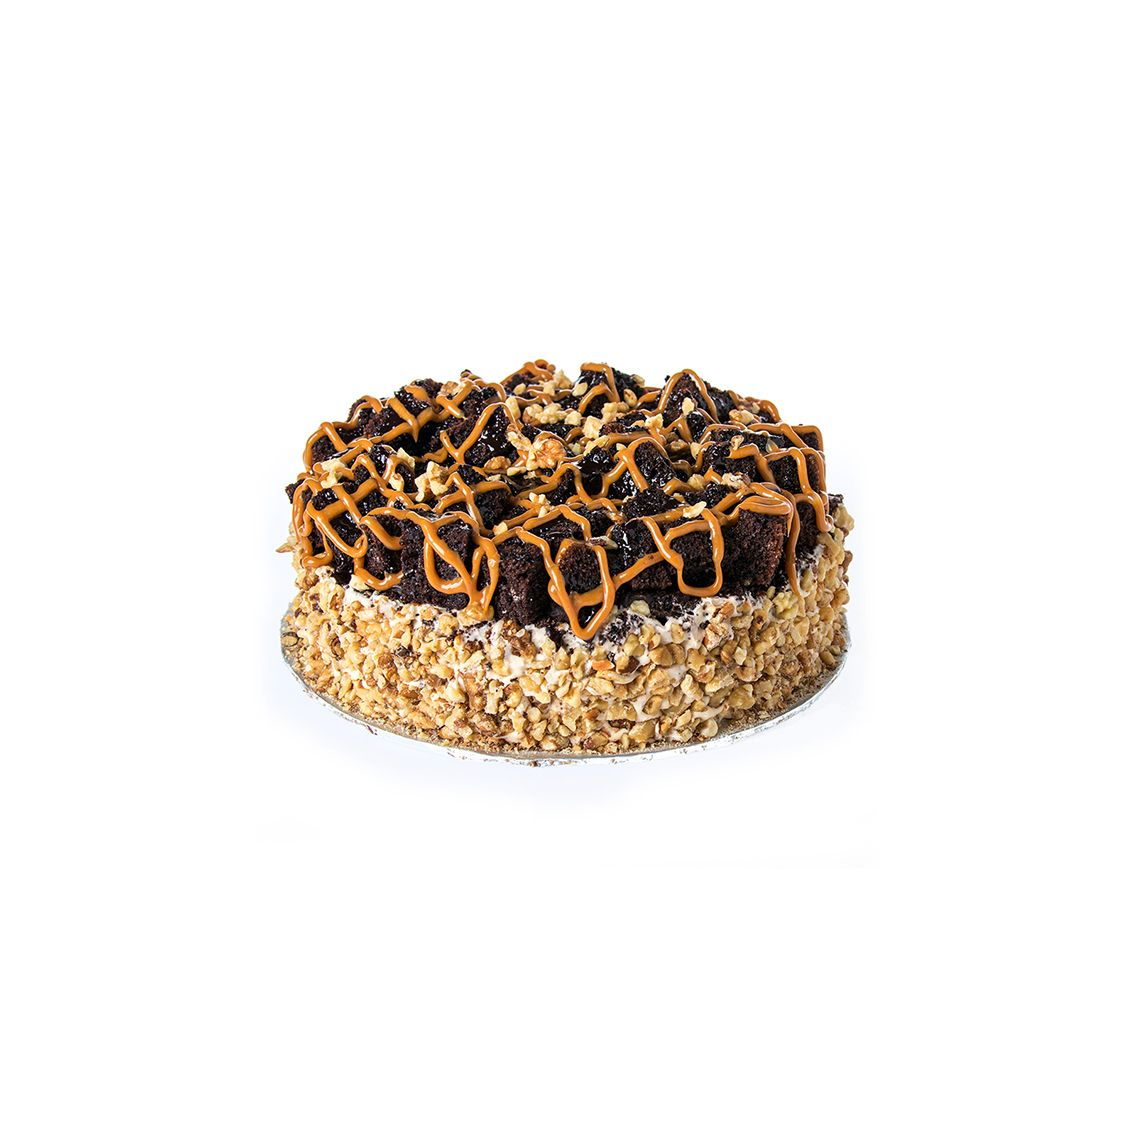 Kitchen Cuisine Default Category Walnut Caramel Cake